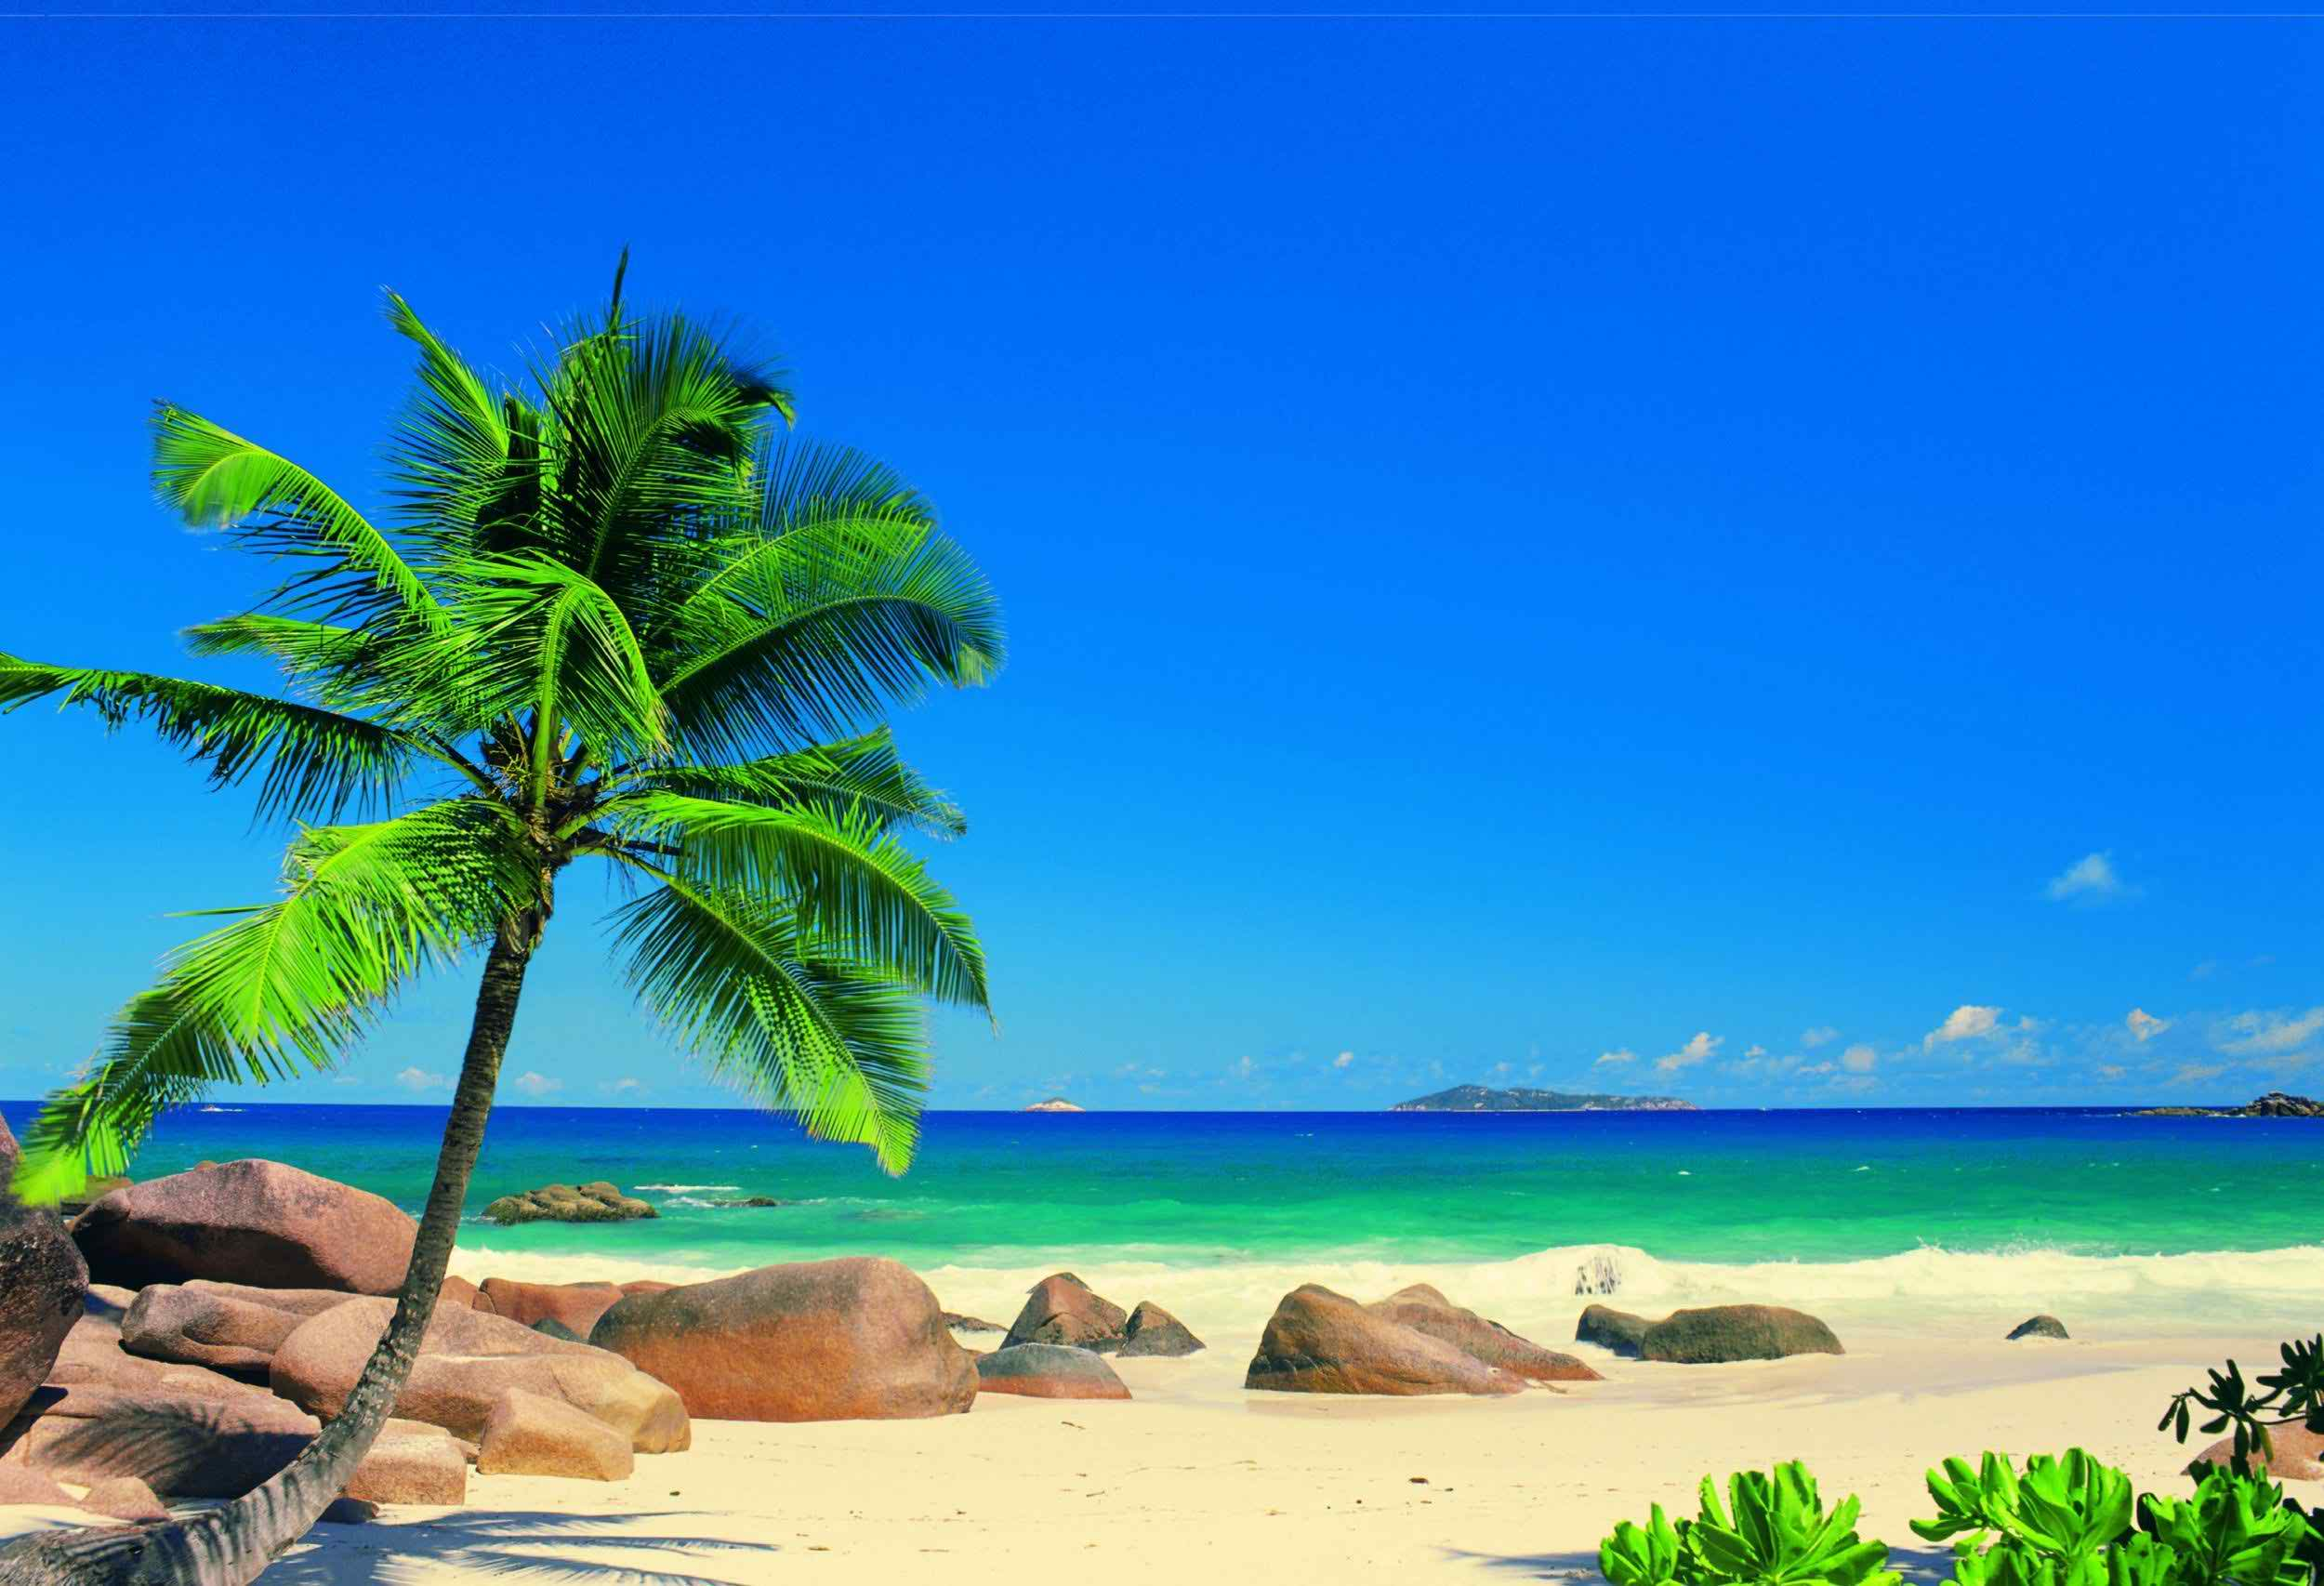 Caribbean HD Desktop Wallpapers Toptenpackcom 2500x1706